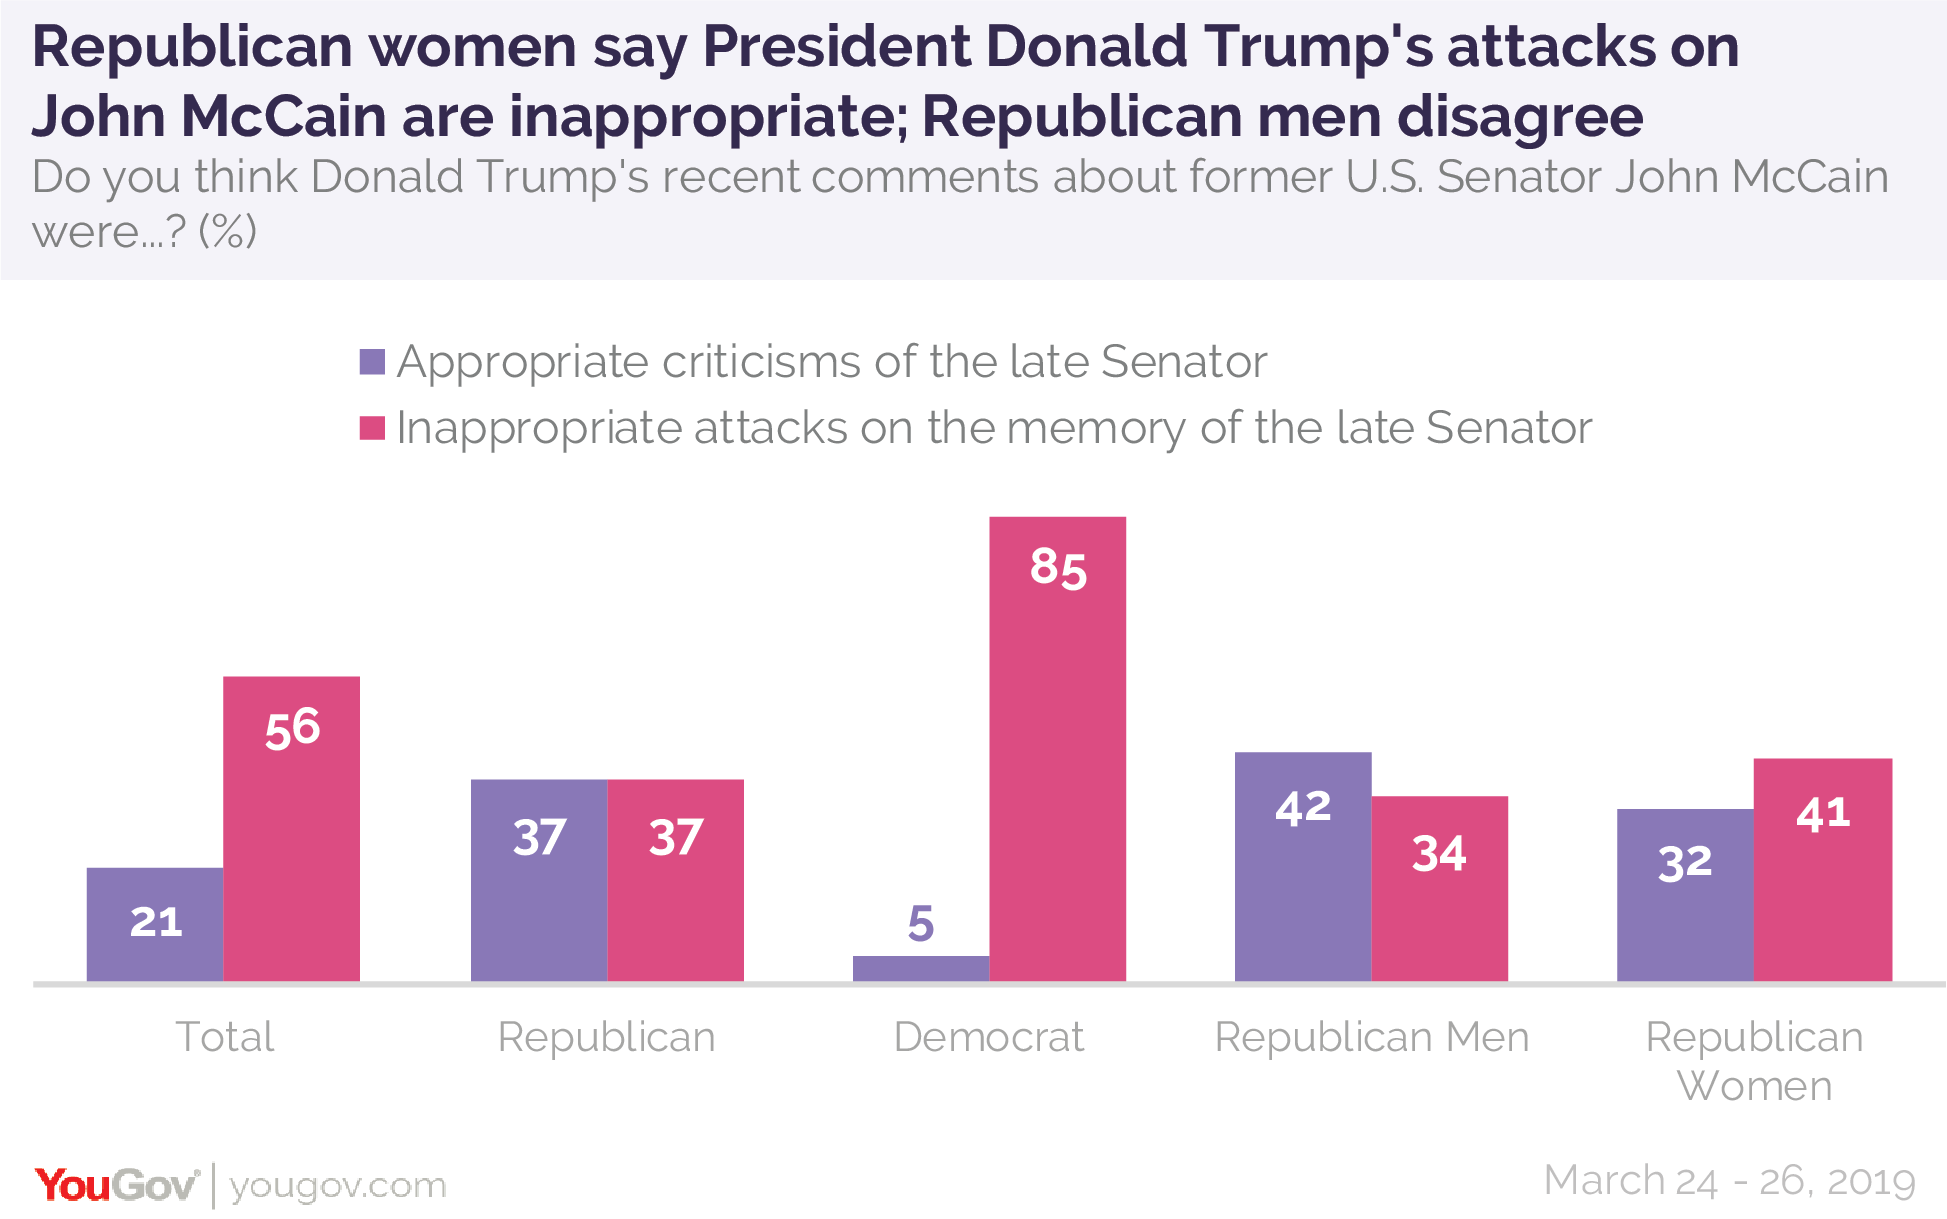 Republican women say President Donald Trump's attacks on John McCain are inappropriate; Republican men disagree